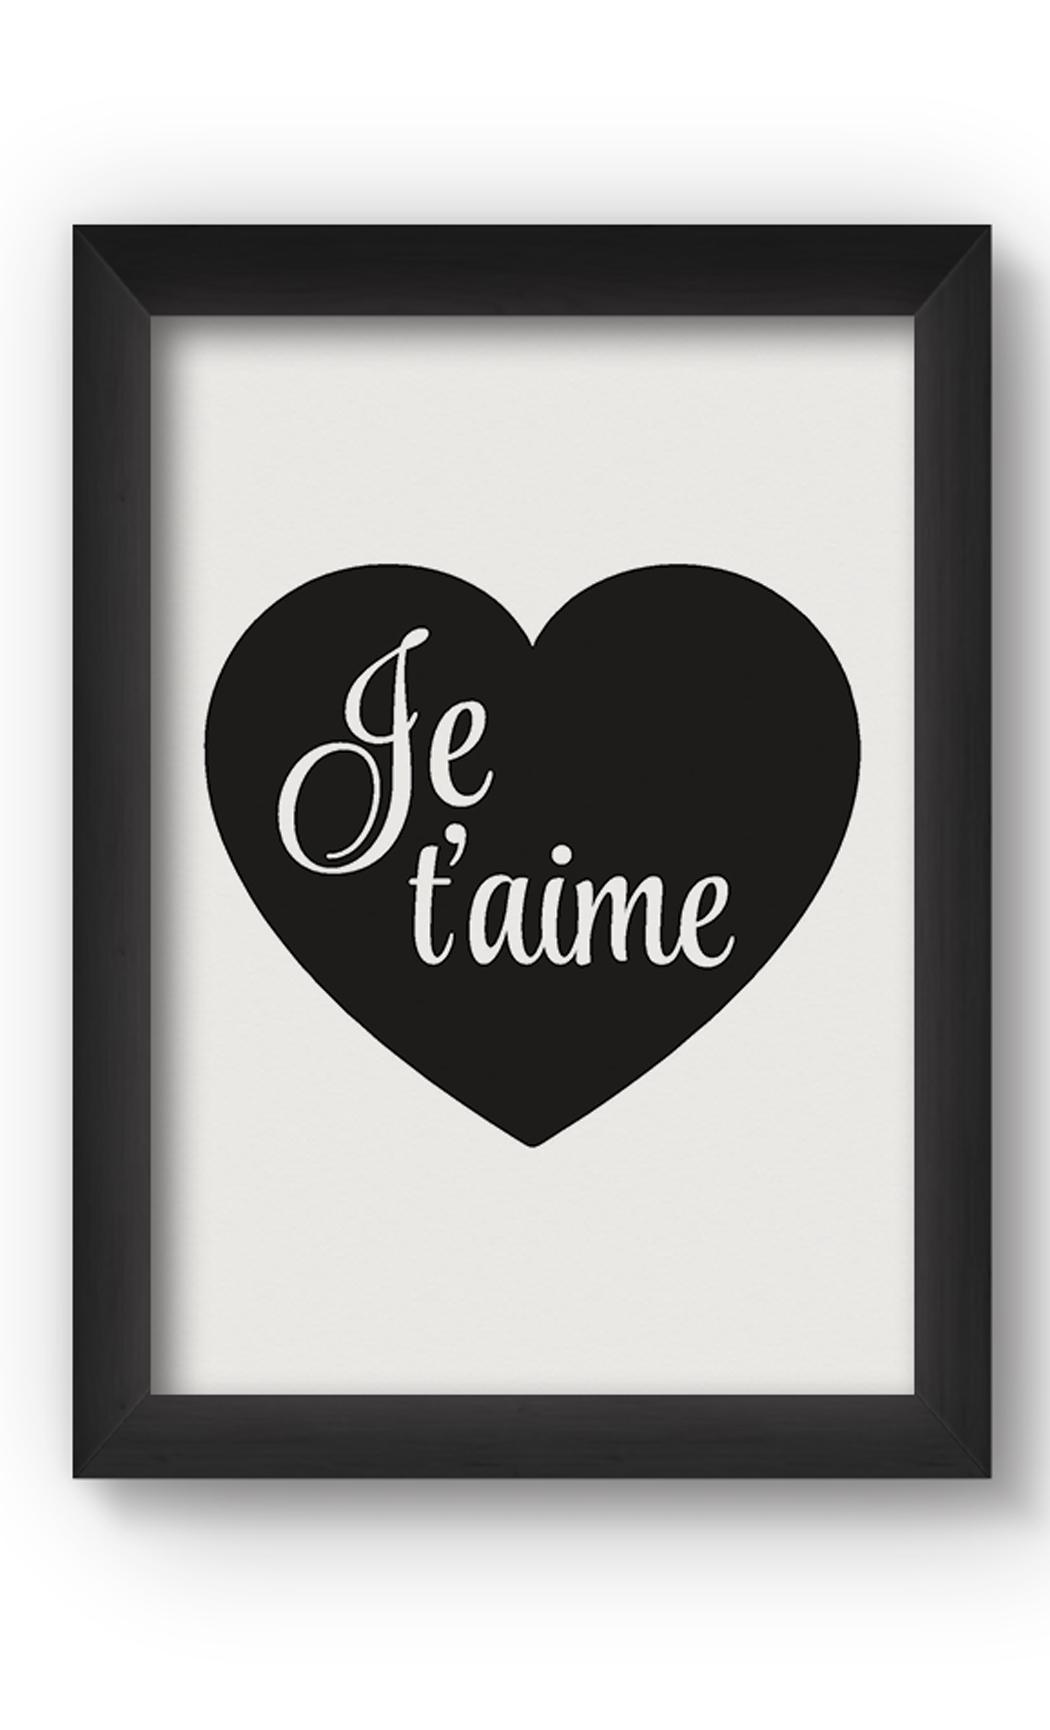 Black & White JE TAIME Poster. Buy Online.